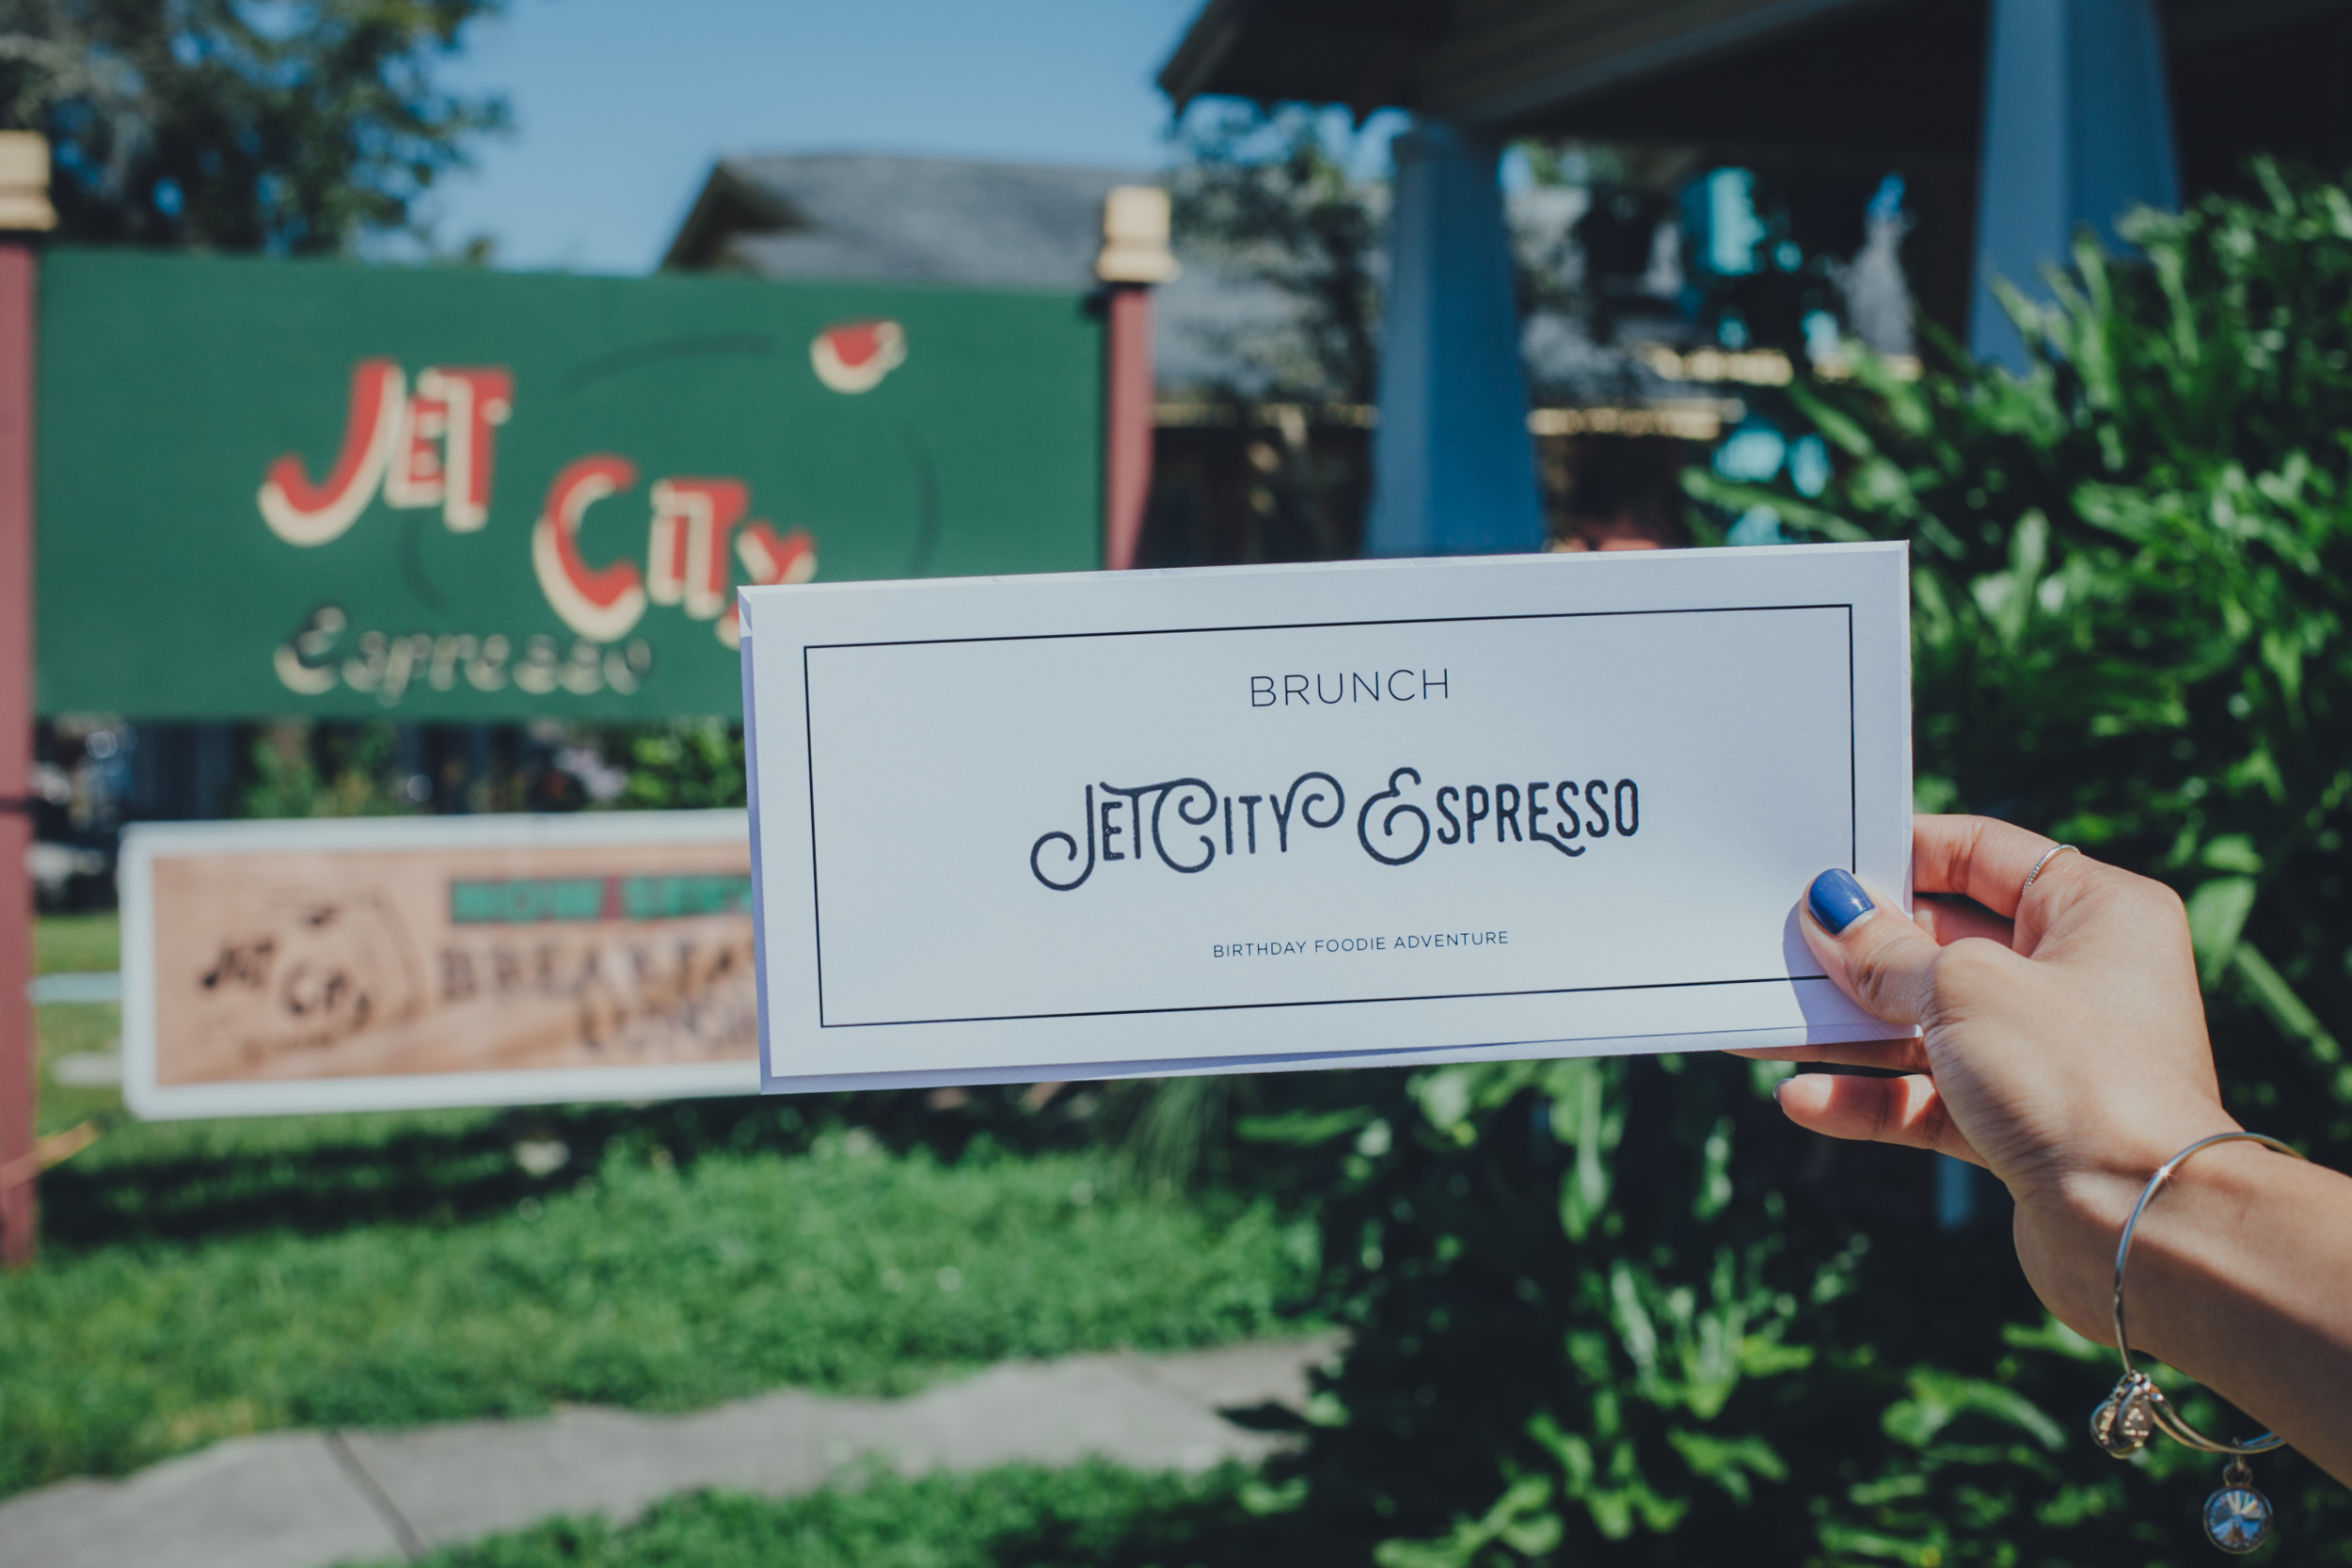 This Jenn Girl - Jet City Espresso 1